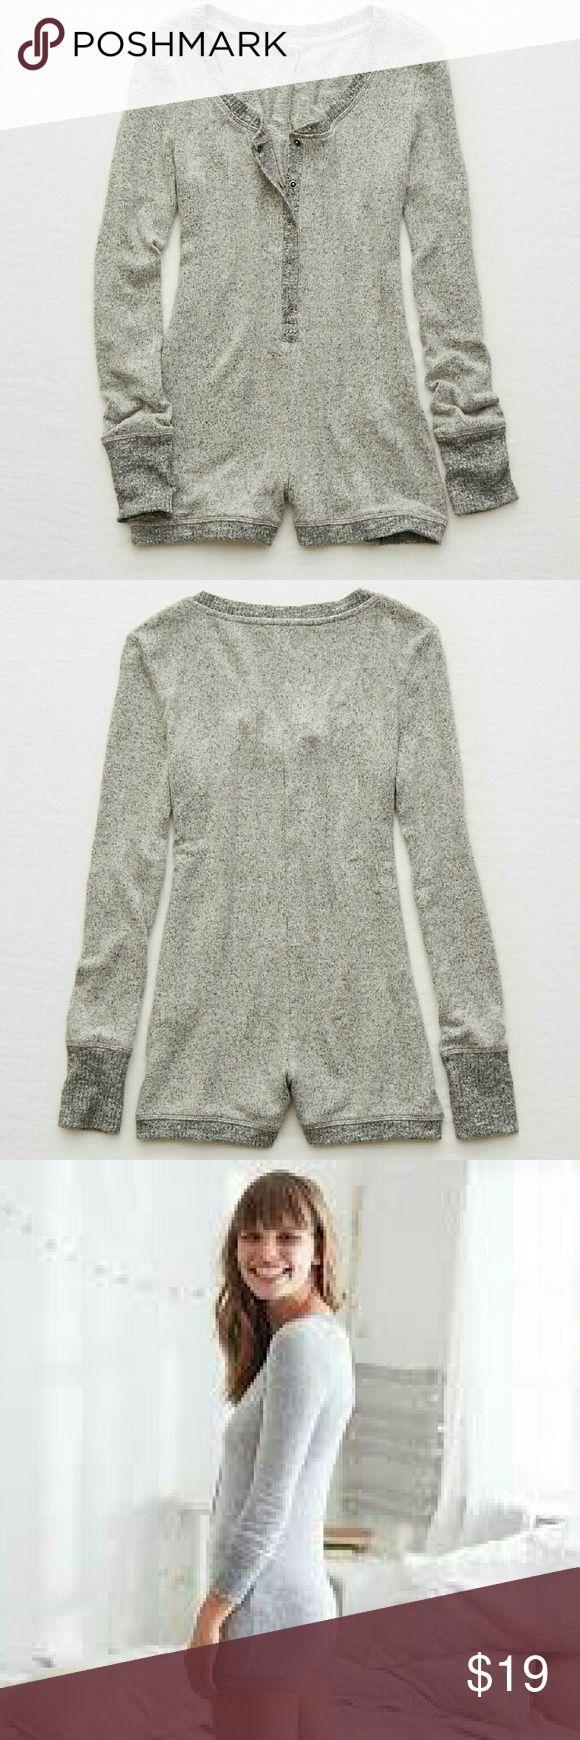 10 best sleep images on pinterest pajama romper romper clothing aerie henley romper geenschuldenfo Image collections